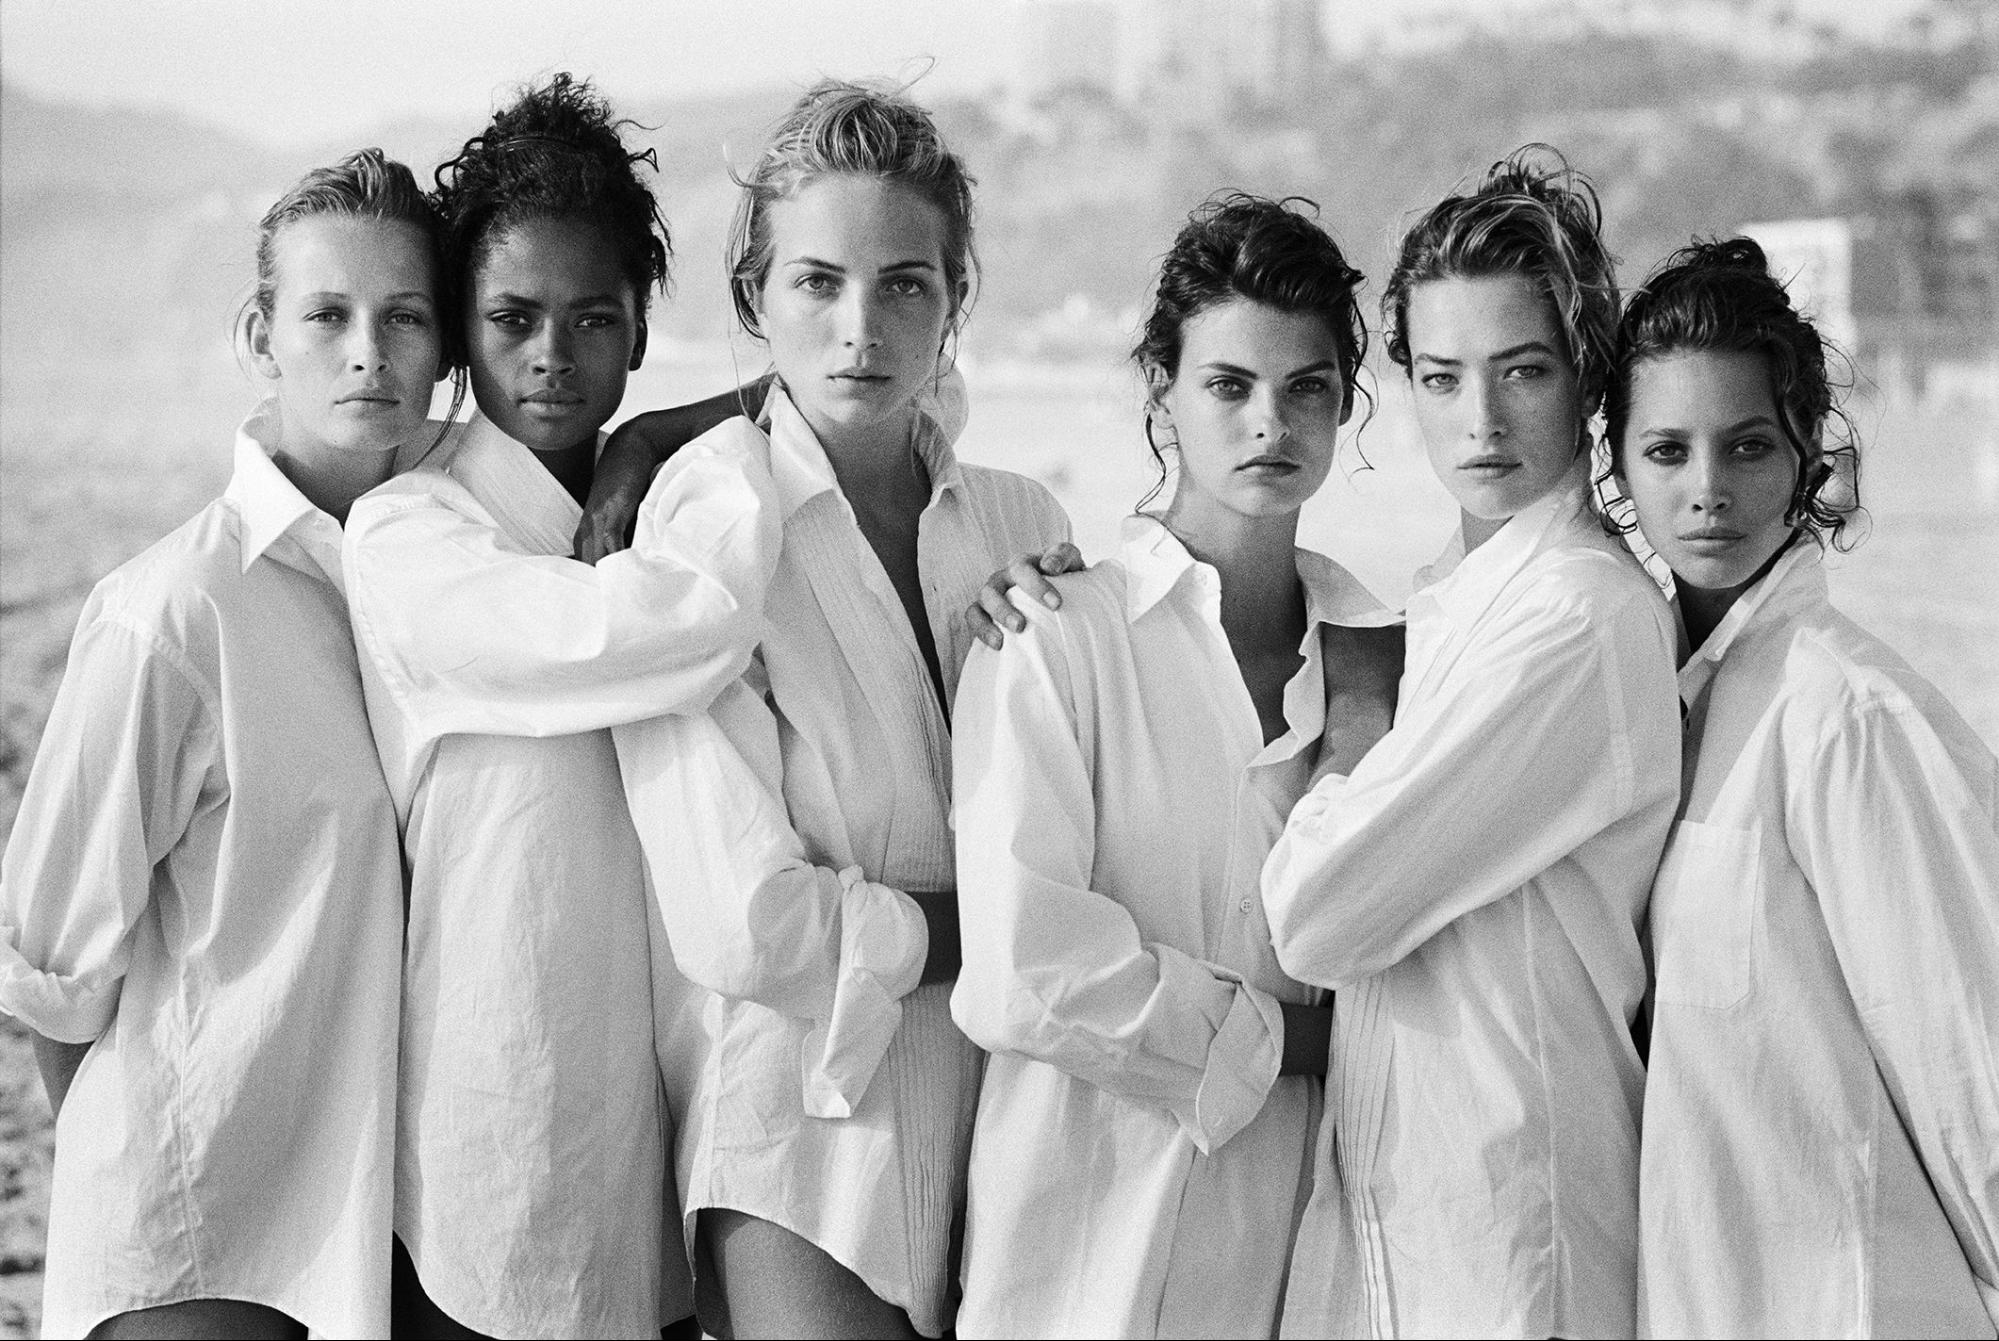 Shot on Hasselblad: Estelle Lefébure, Karen Alexander, Rachel Williams, Linda Evangelista, Tatjana Patitz and Christy Turlington, Malibu, 1988 © Peter Lindbergh